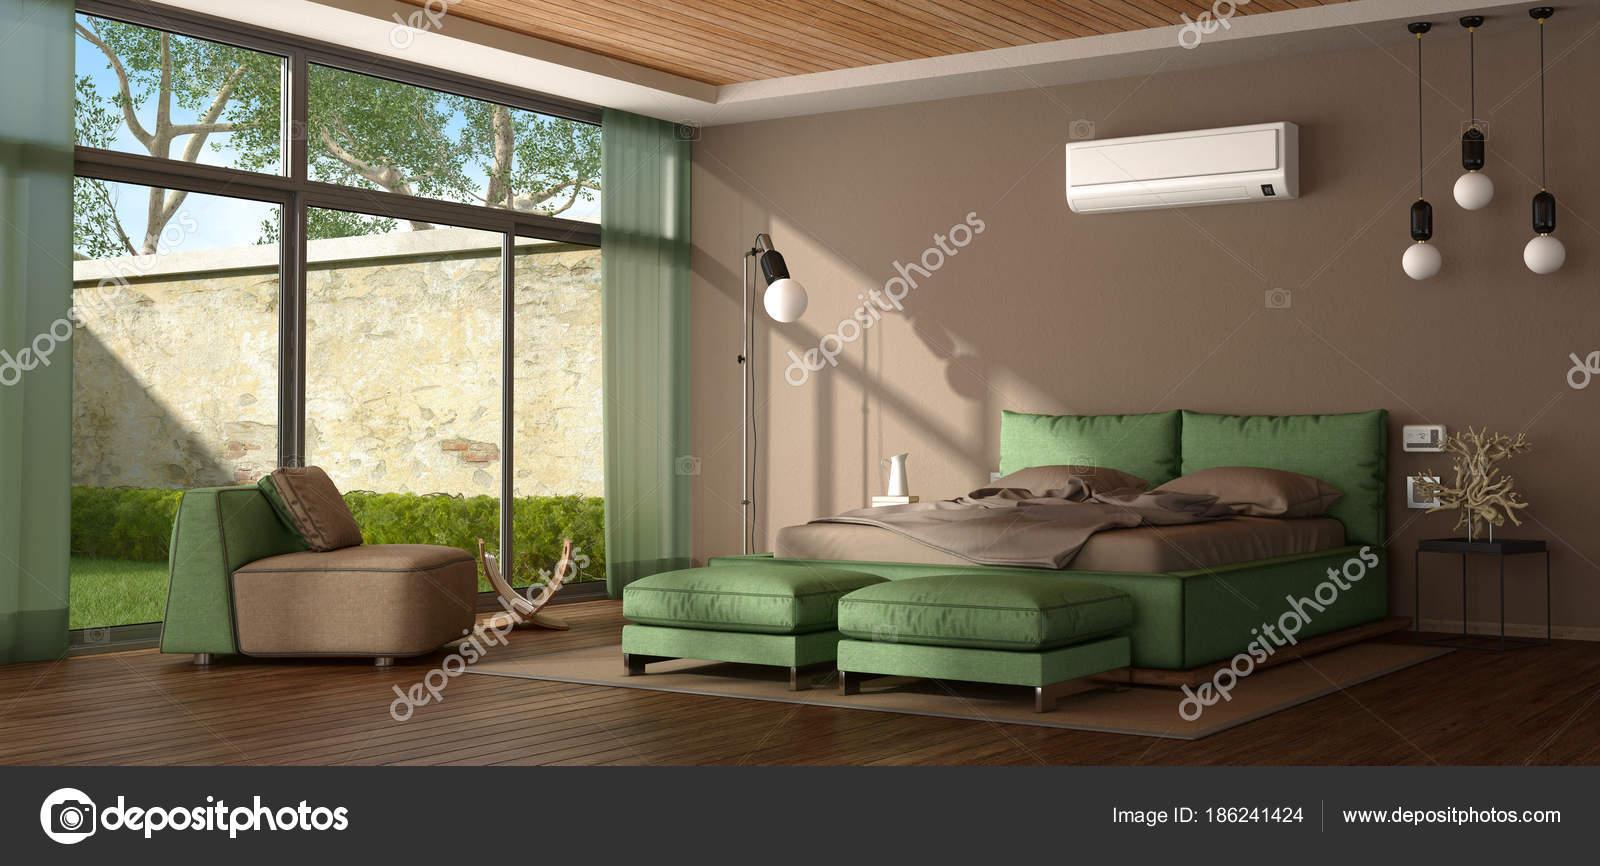 Camera Da Letto Moderna Marrone : Camera matrimoniale moderna marrone e verde u foto stock